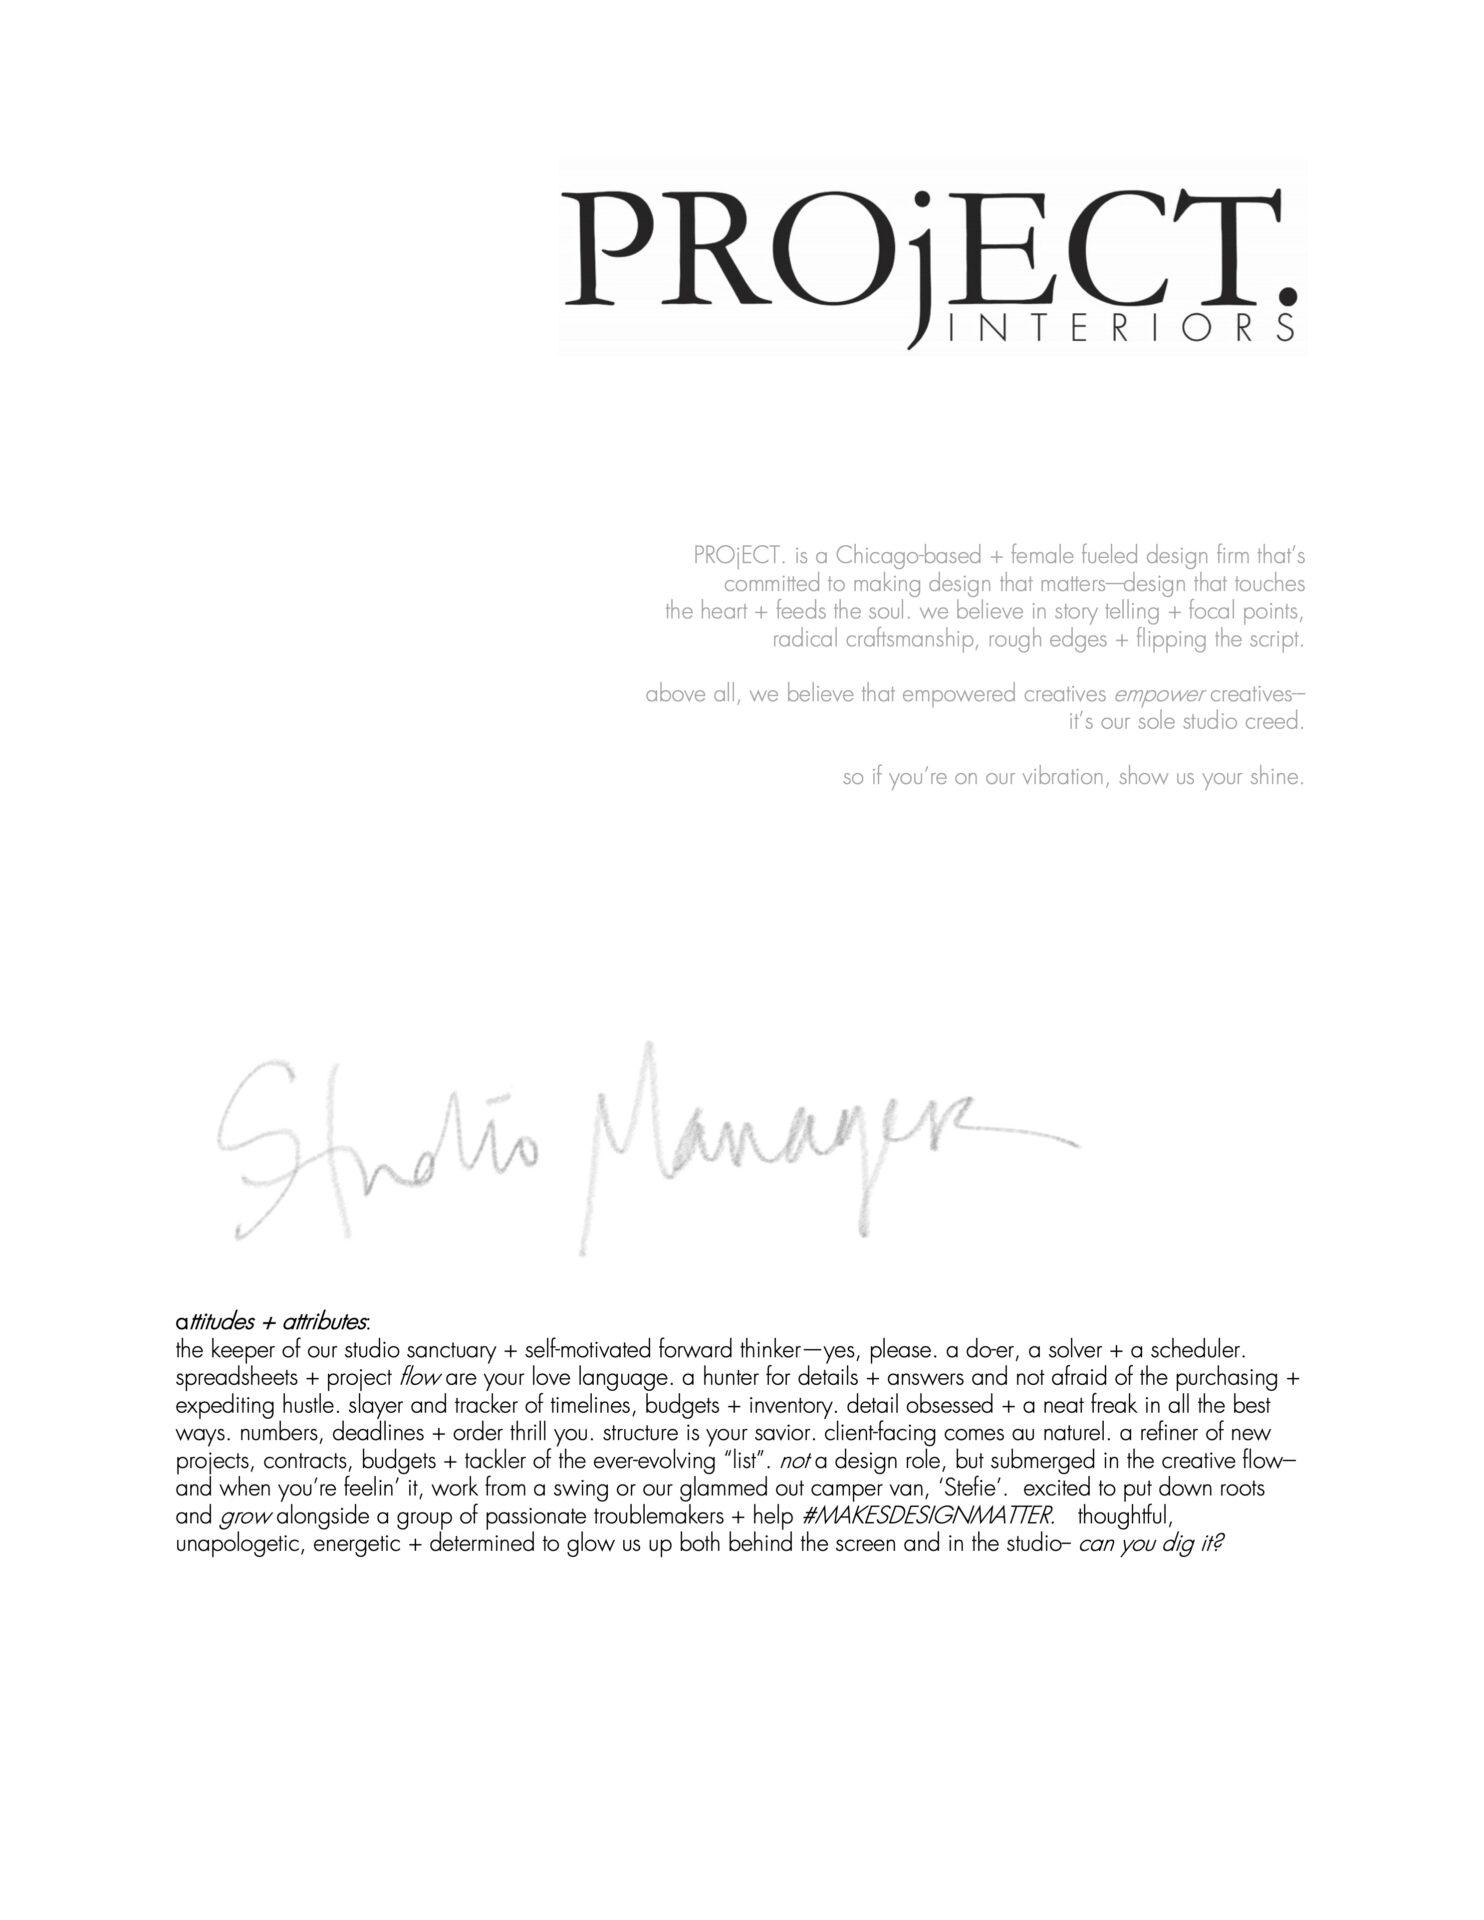 PROjECT Senior Designer Position - page 1